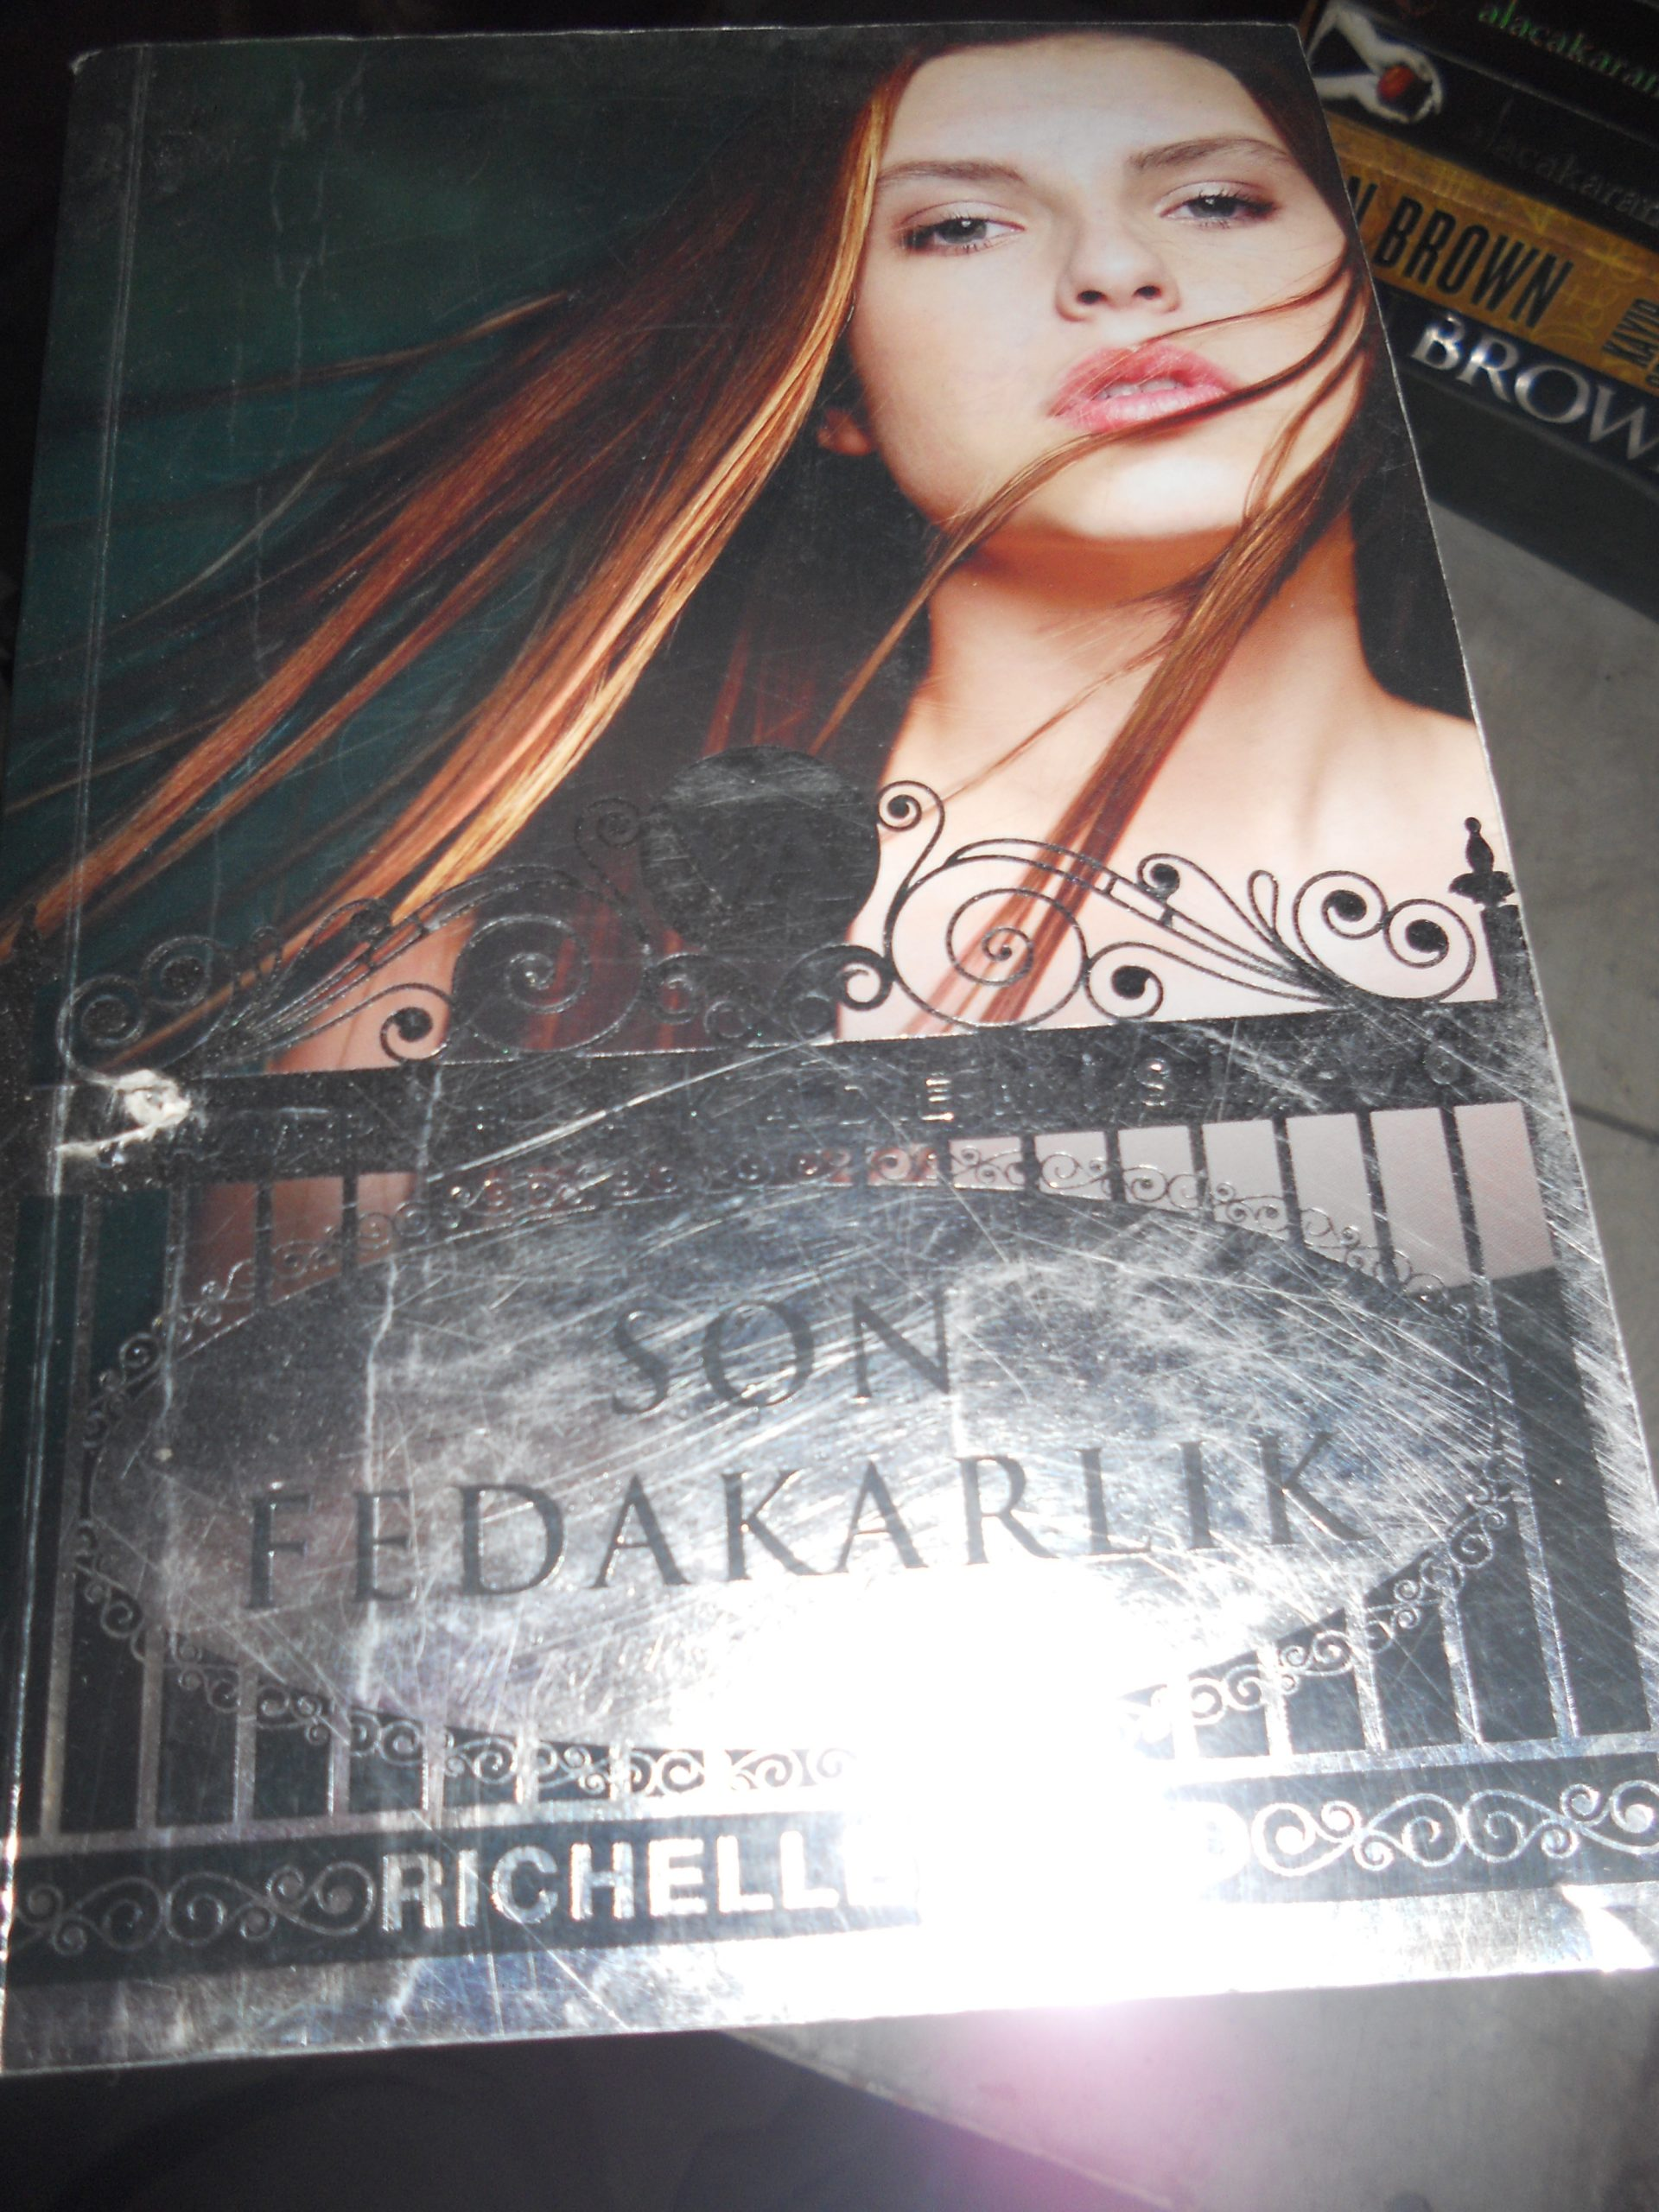 SON FEDAKARLIK(Vampir Akademisi-6) Rıchella MEAD/ 10 TL